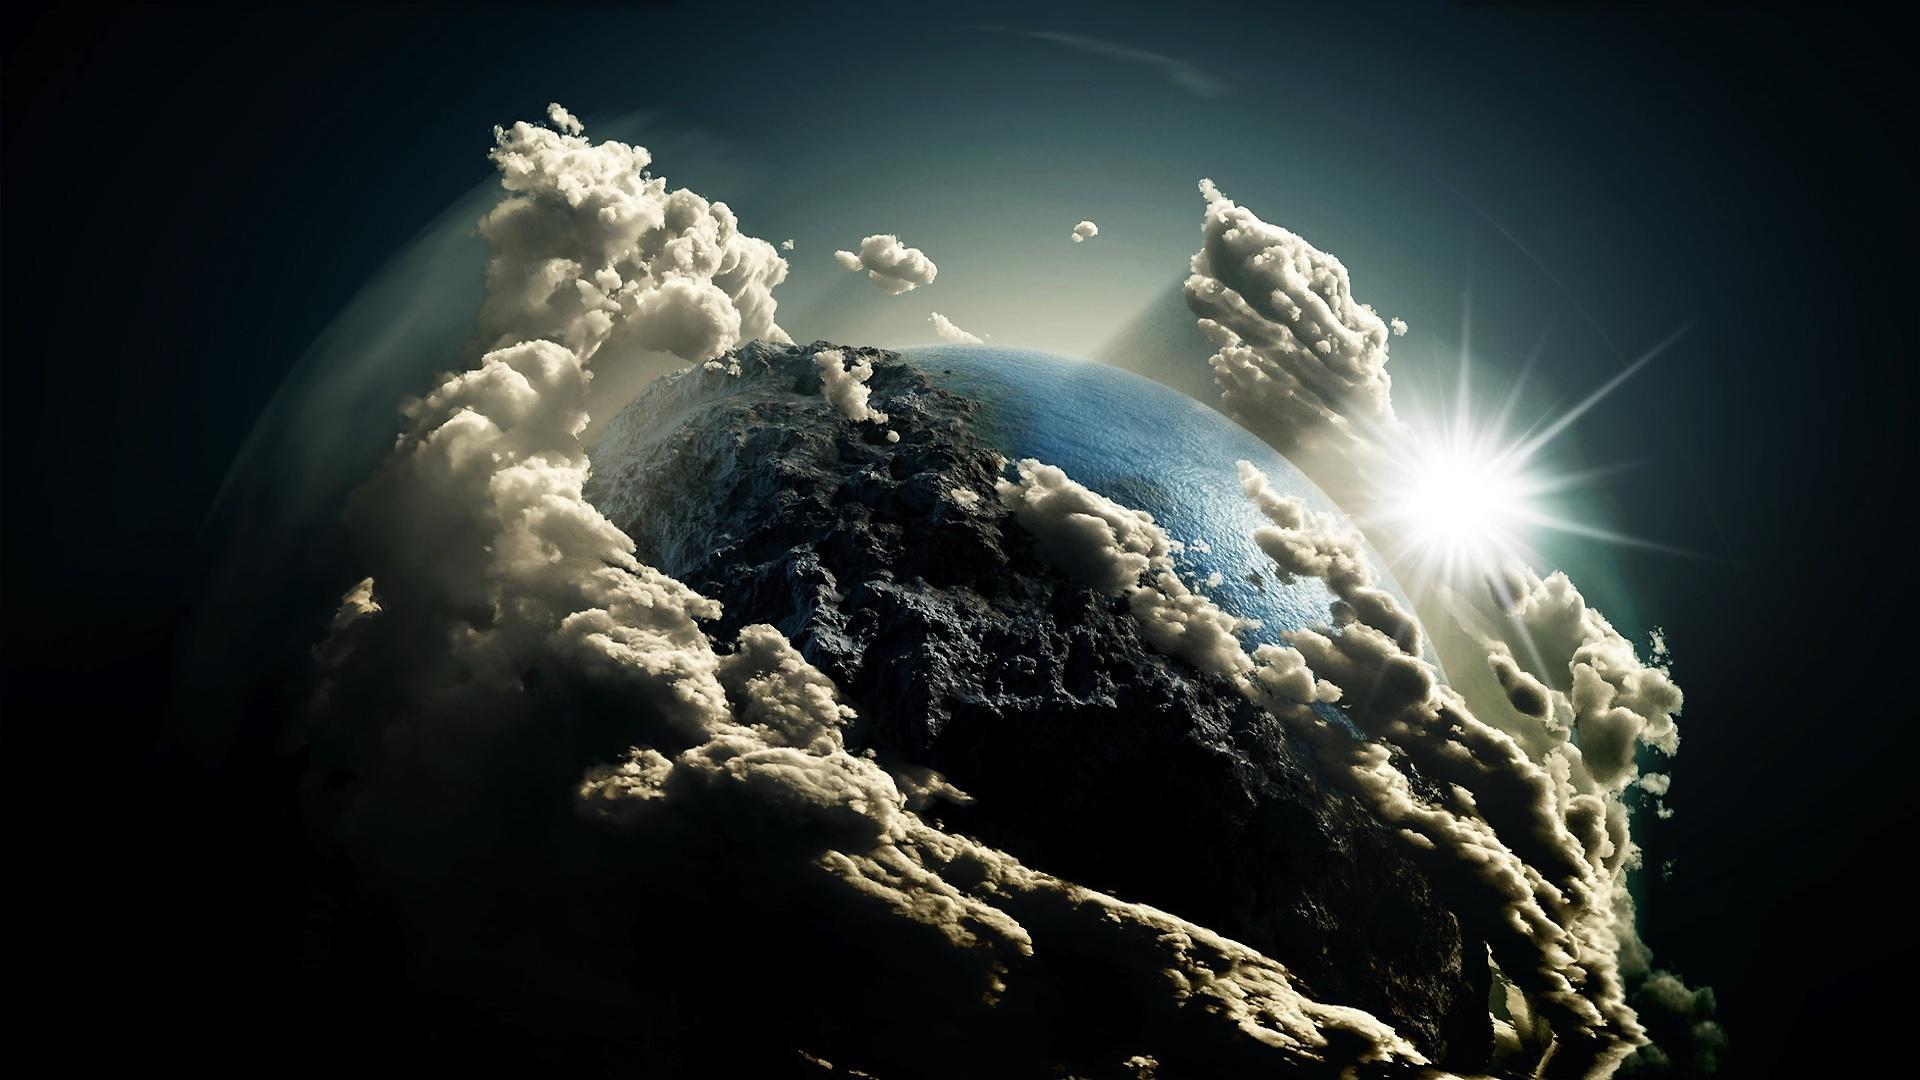 planet earth wallpaper hd - sf wallpaper